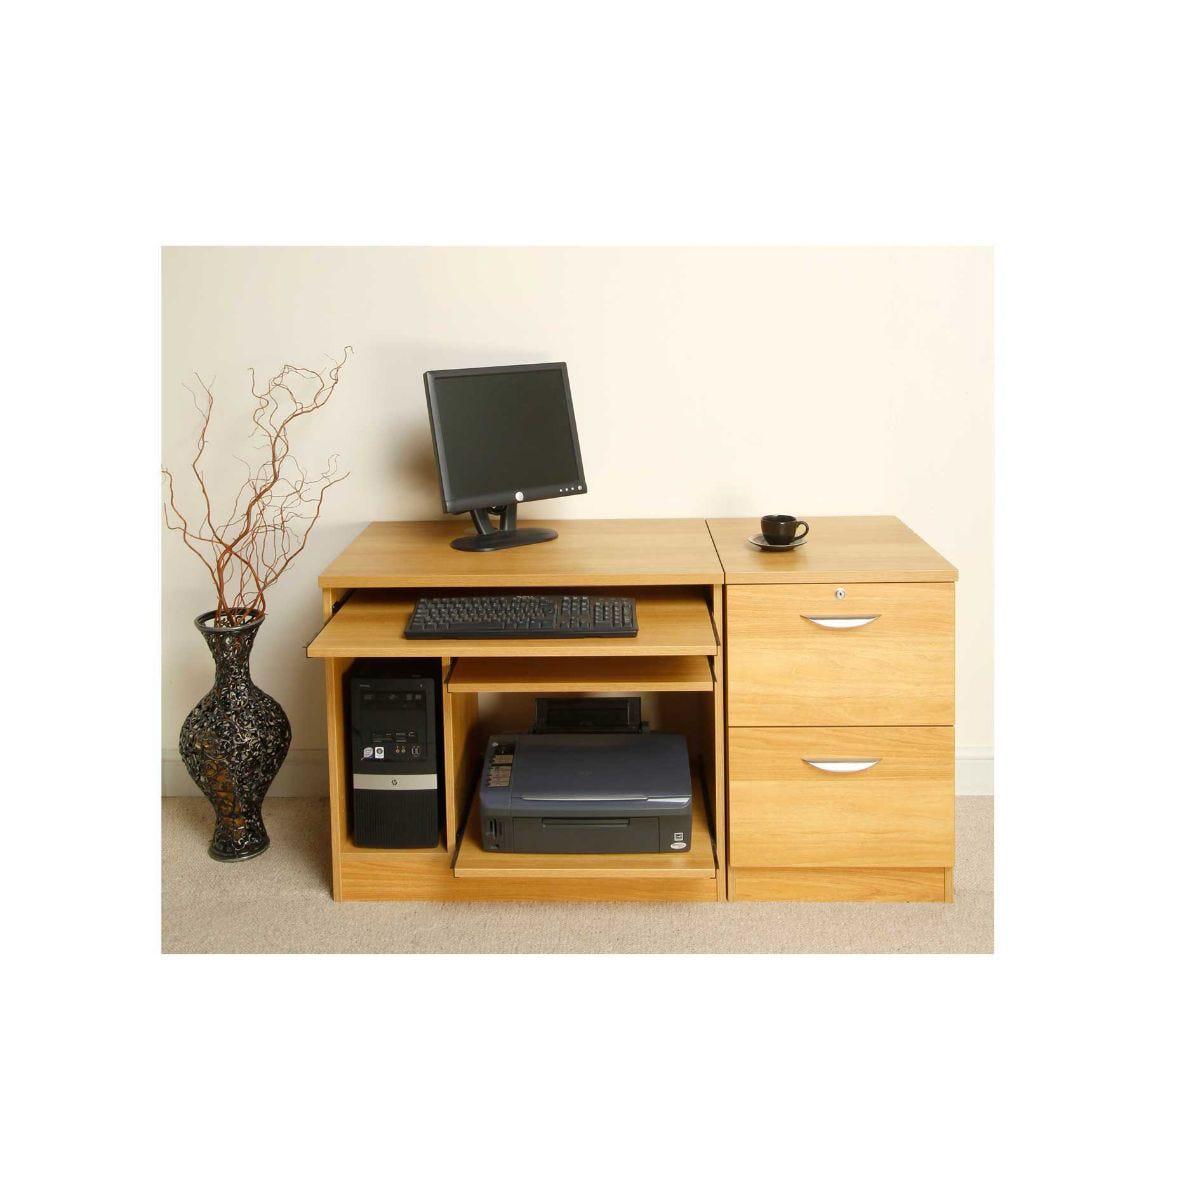 R White Lawrence Desk Workstation, English Oak